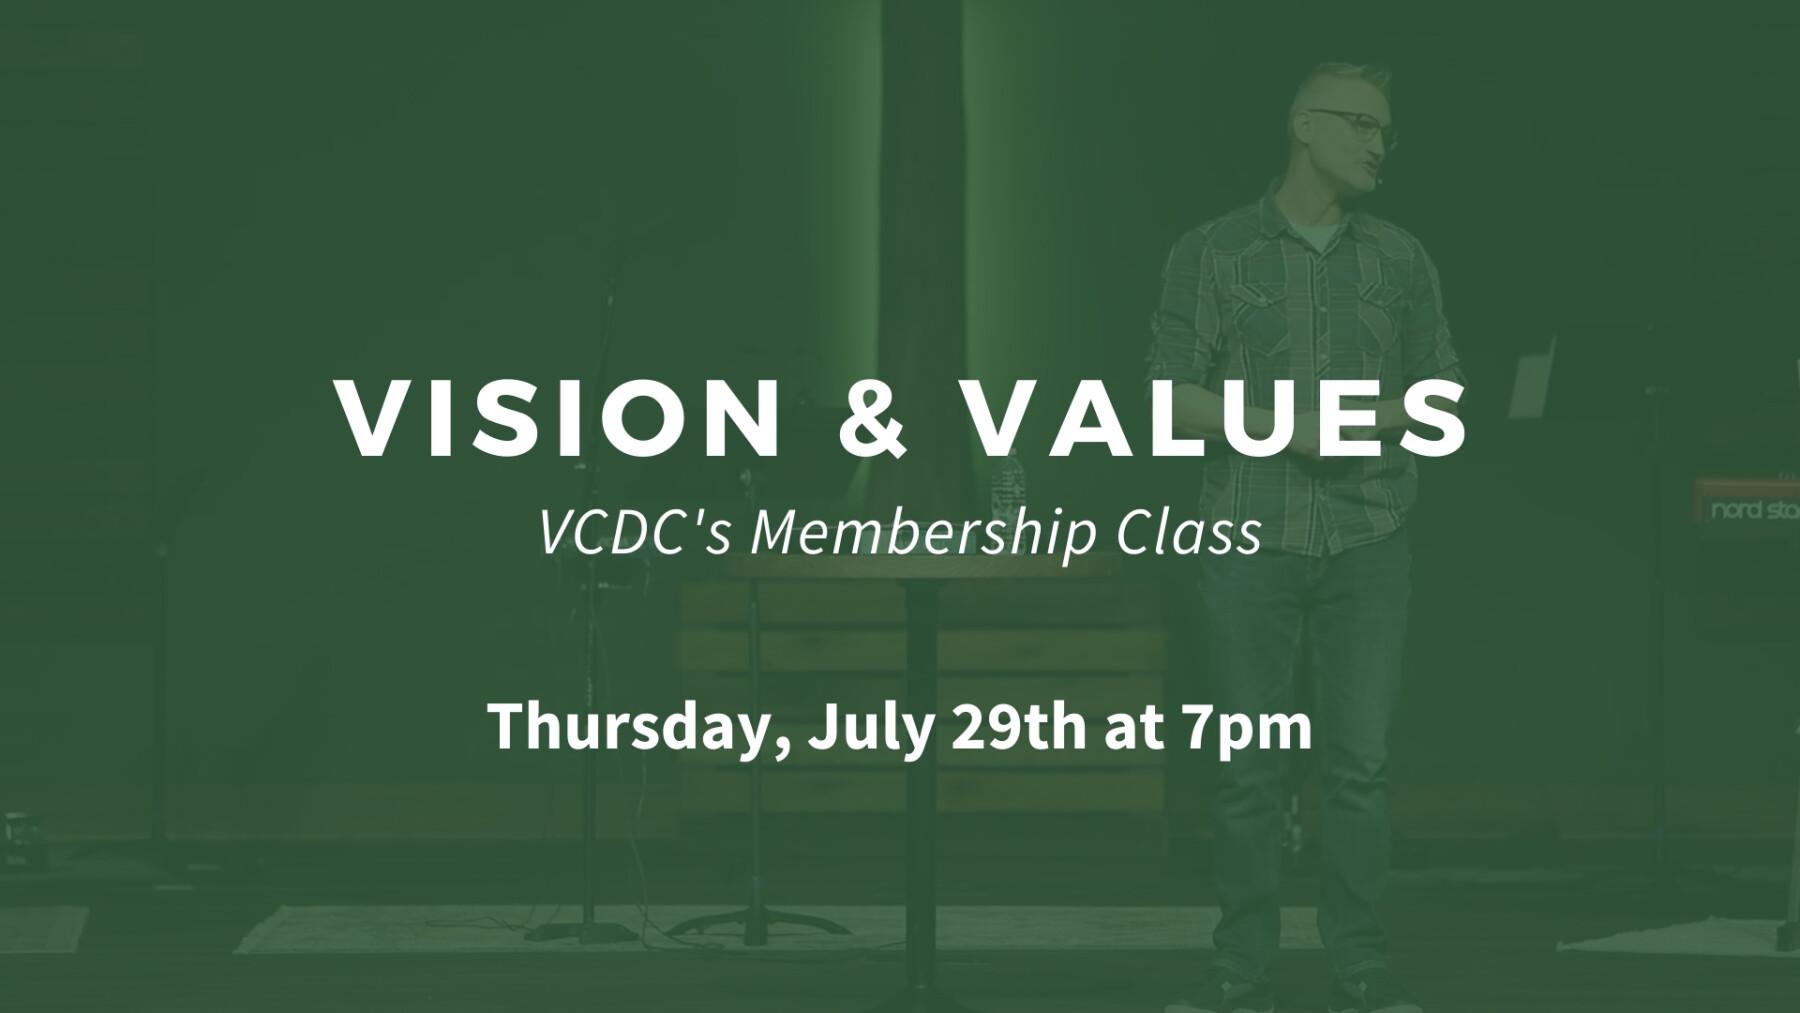 Vision & Values - Thursday, July 29th at 7pm